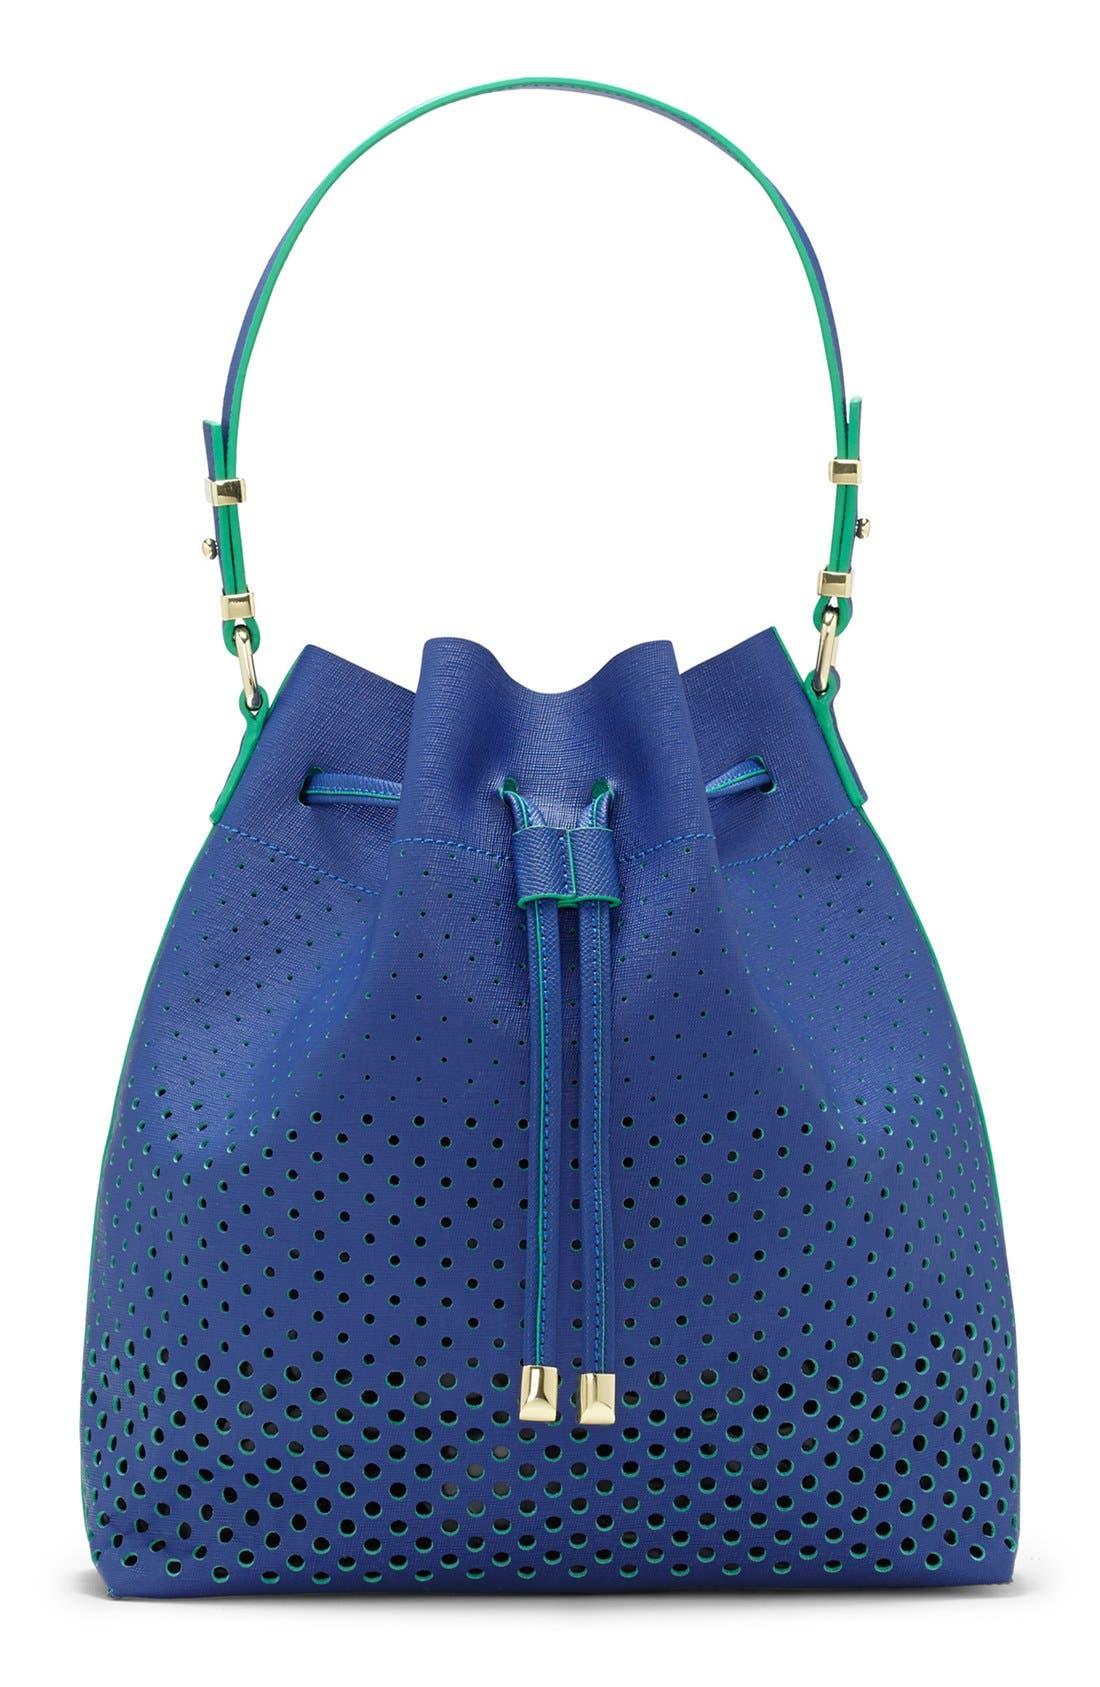 Main Image - Vince Camuto 'Leila' Drawstring Bucket Bag